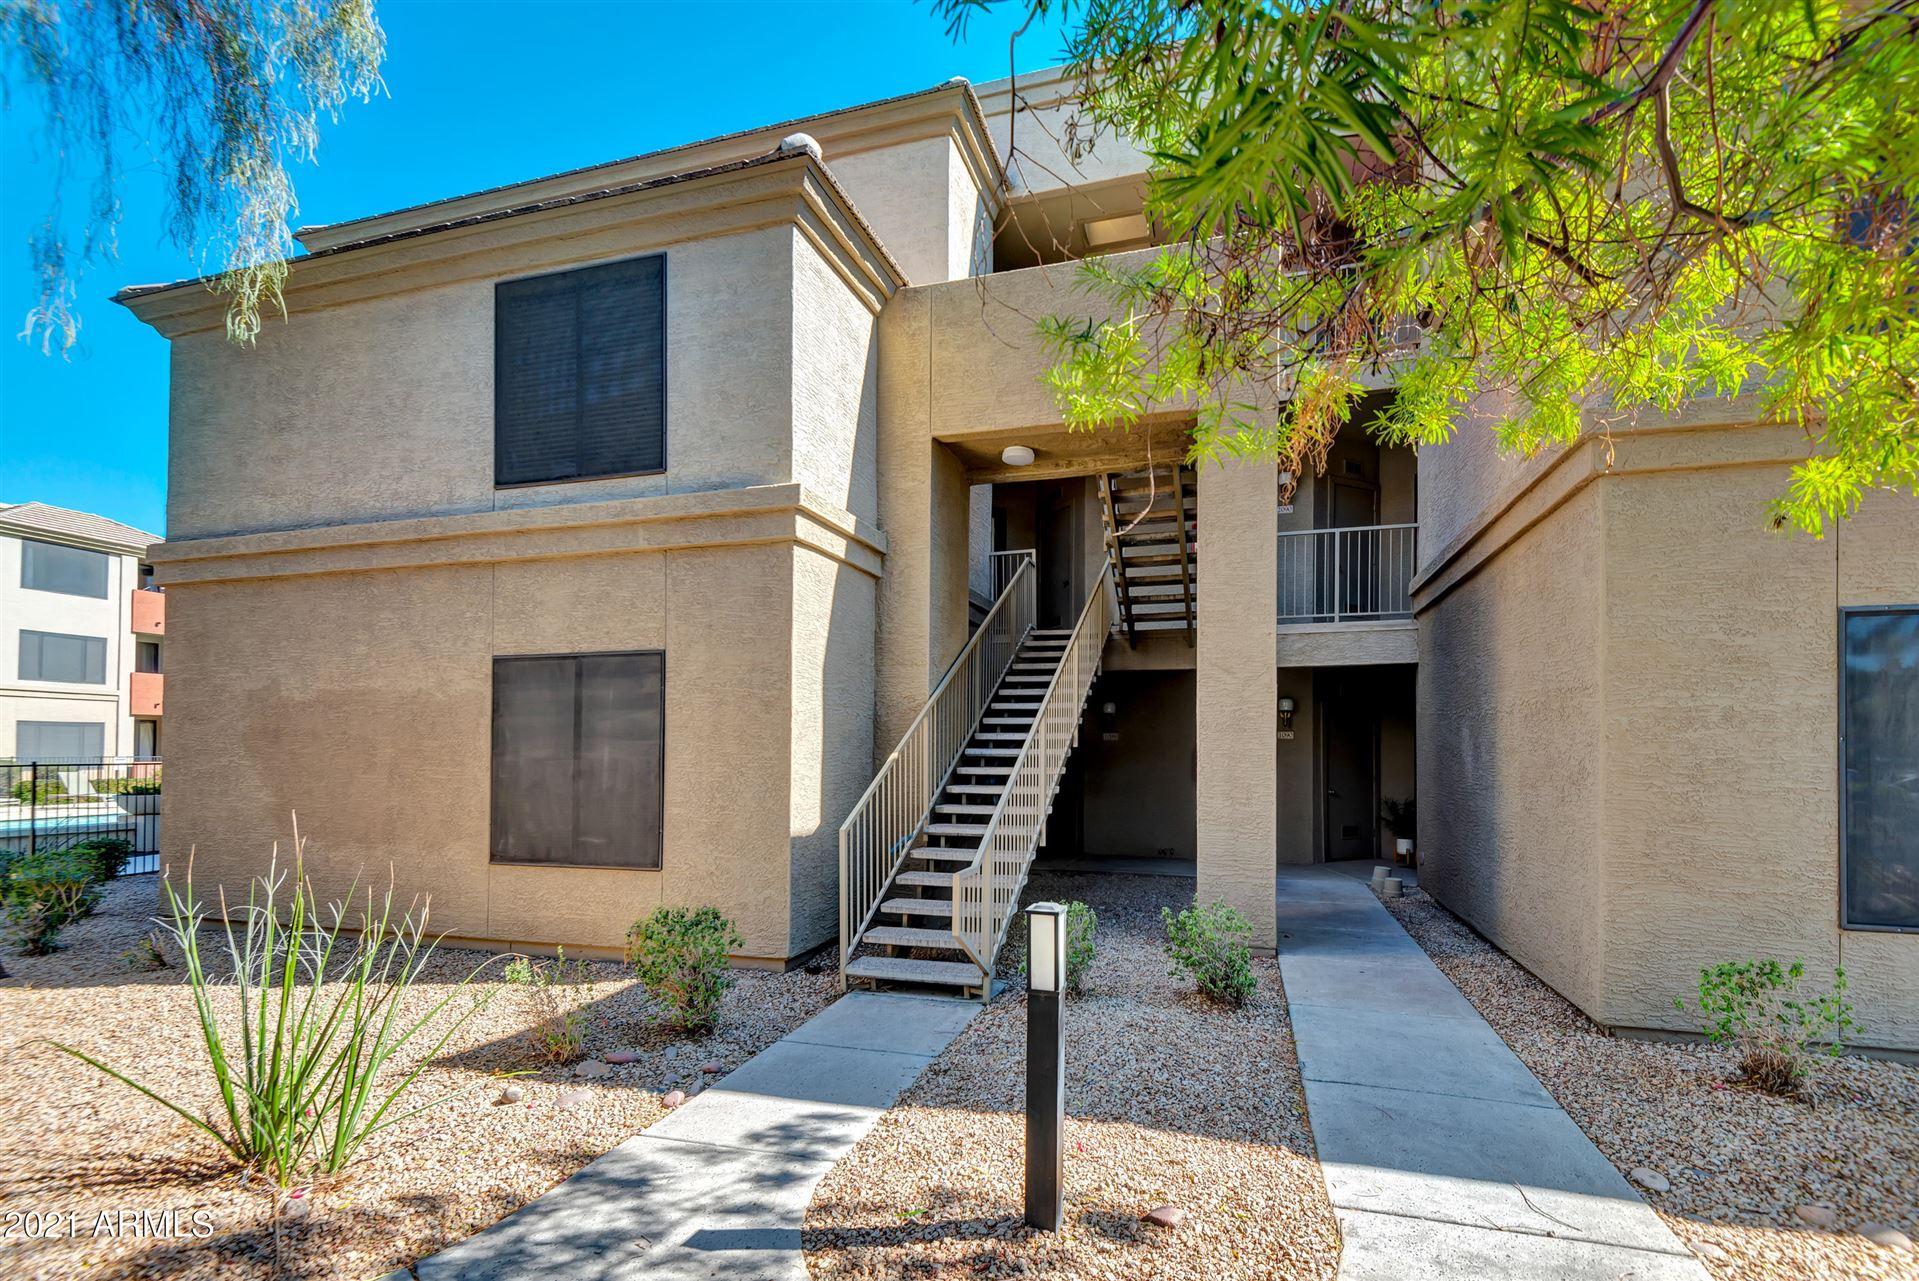 Photo of 3848 N 3RD Avenue #2089, Phoenix, AZ 85013 (MLS # 6200722)